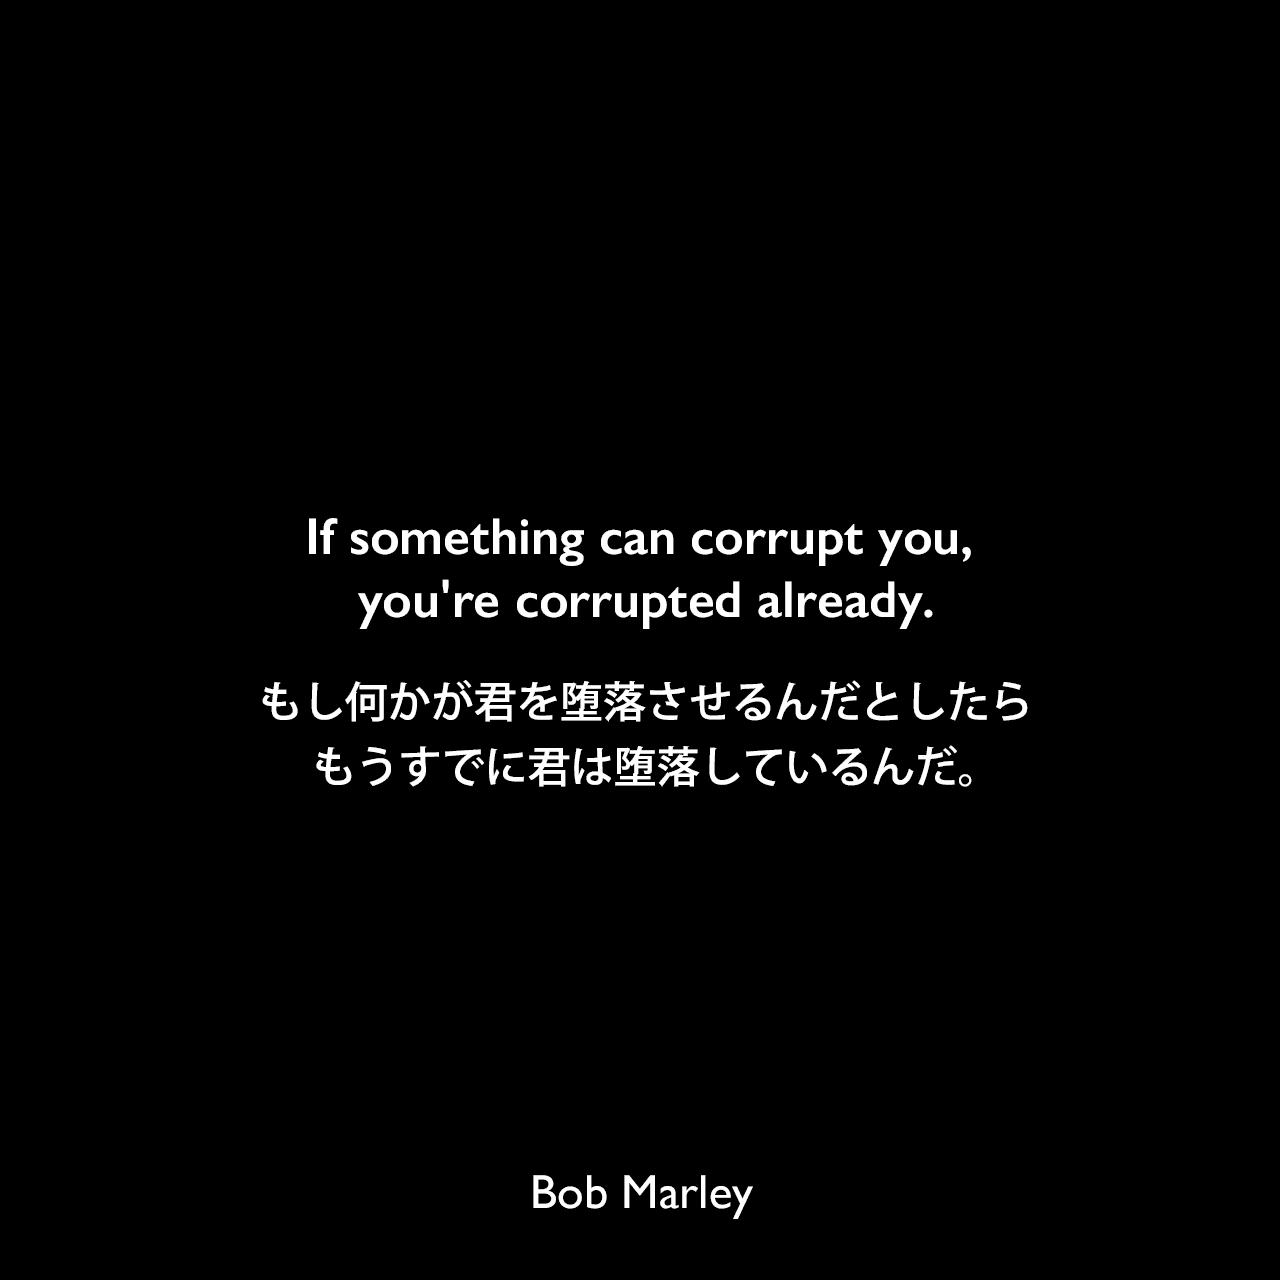 If something can corrupt you, you're corrupted already.もし何かが君を堕落させるんだとしたら、もうすでに君は堕落しているんだ。Bob Marley